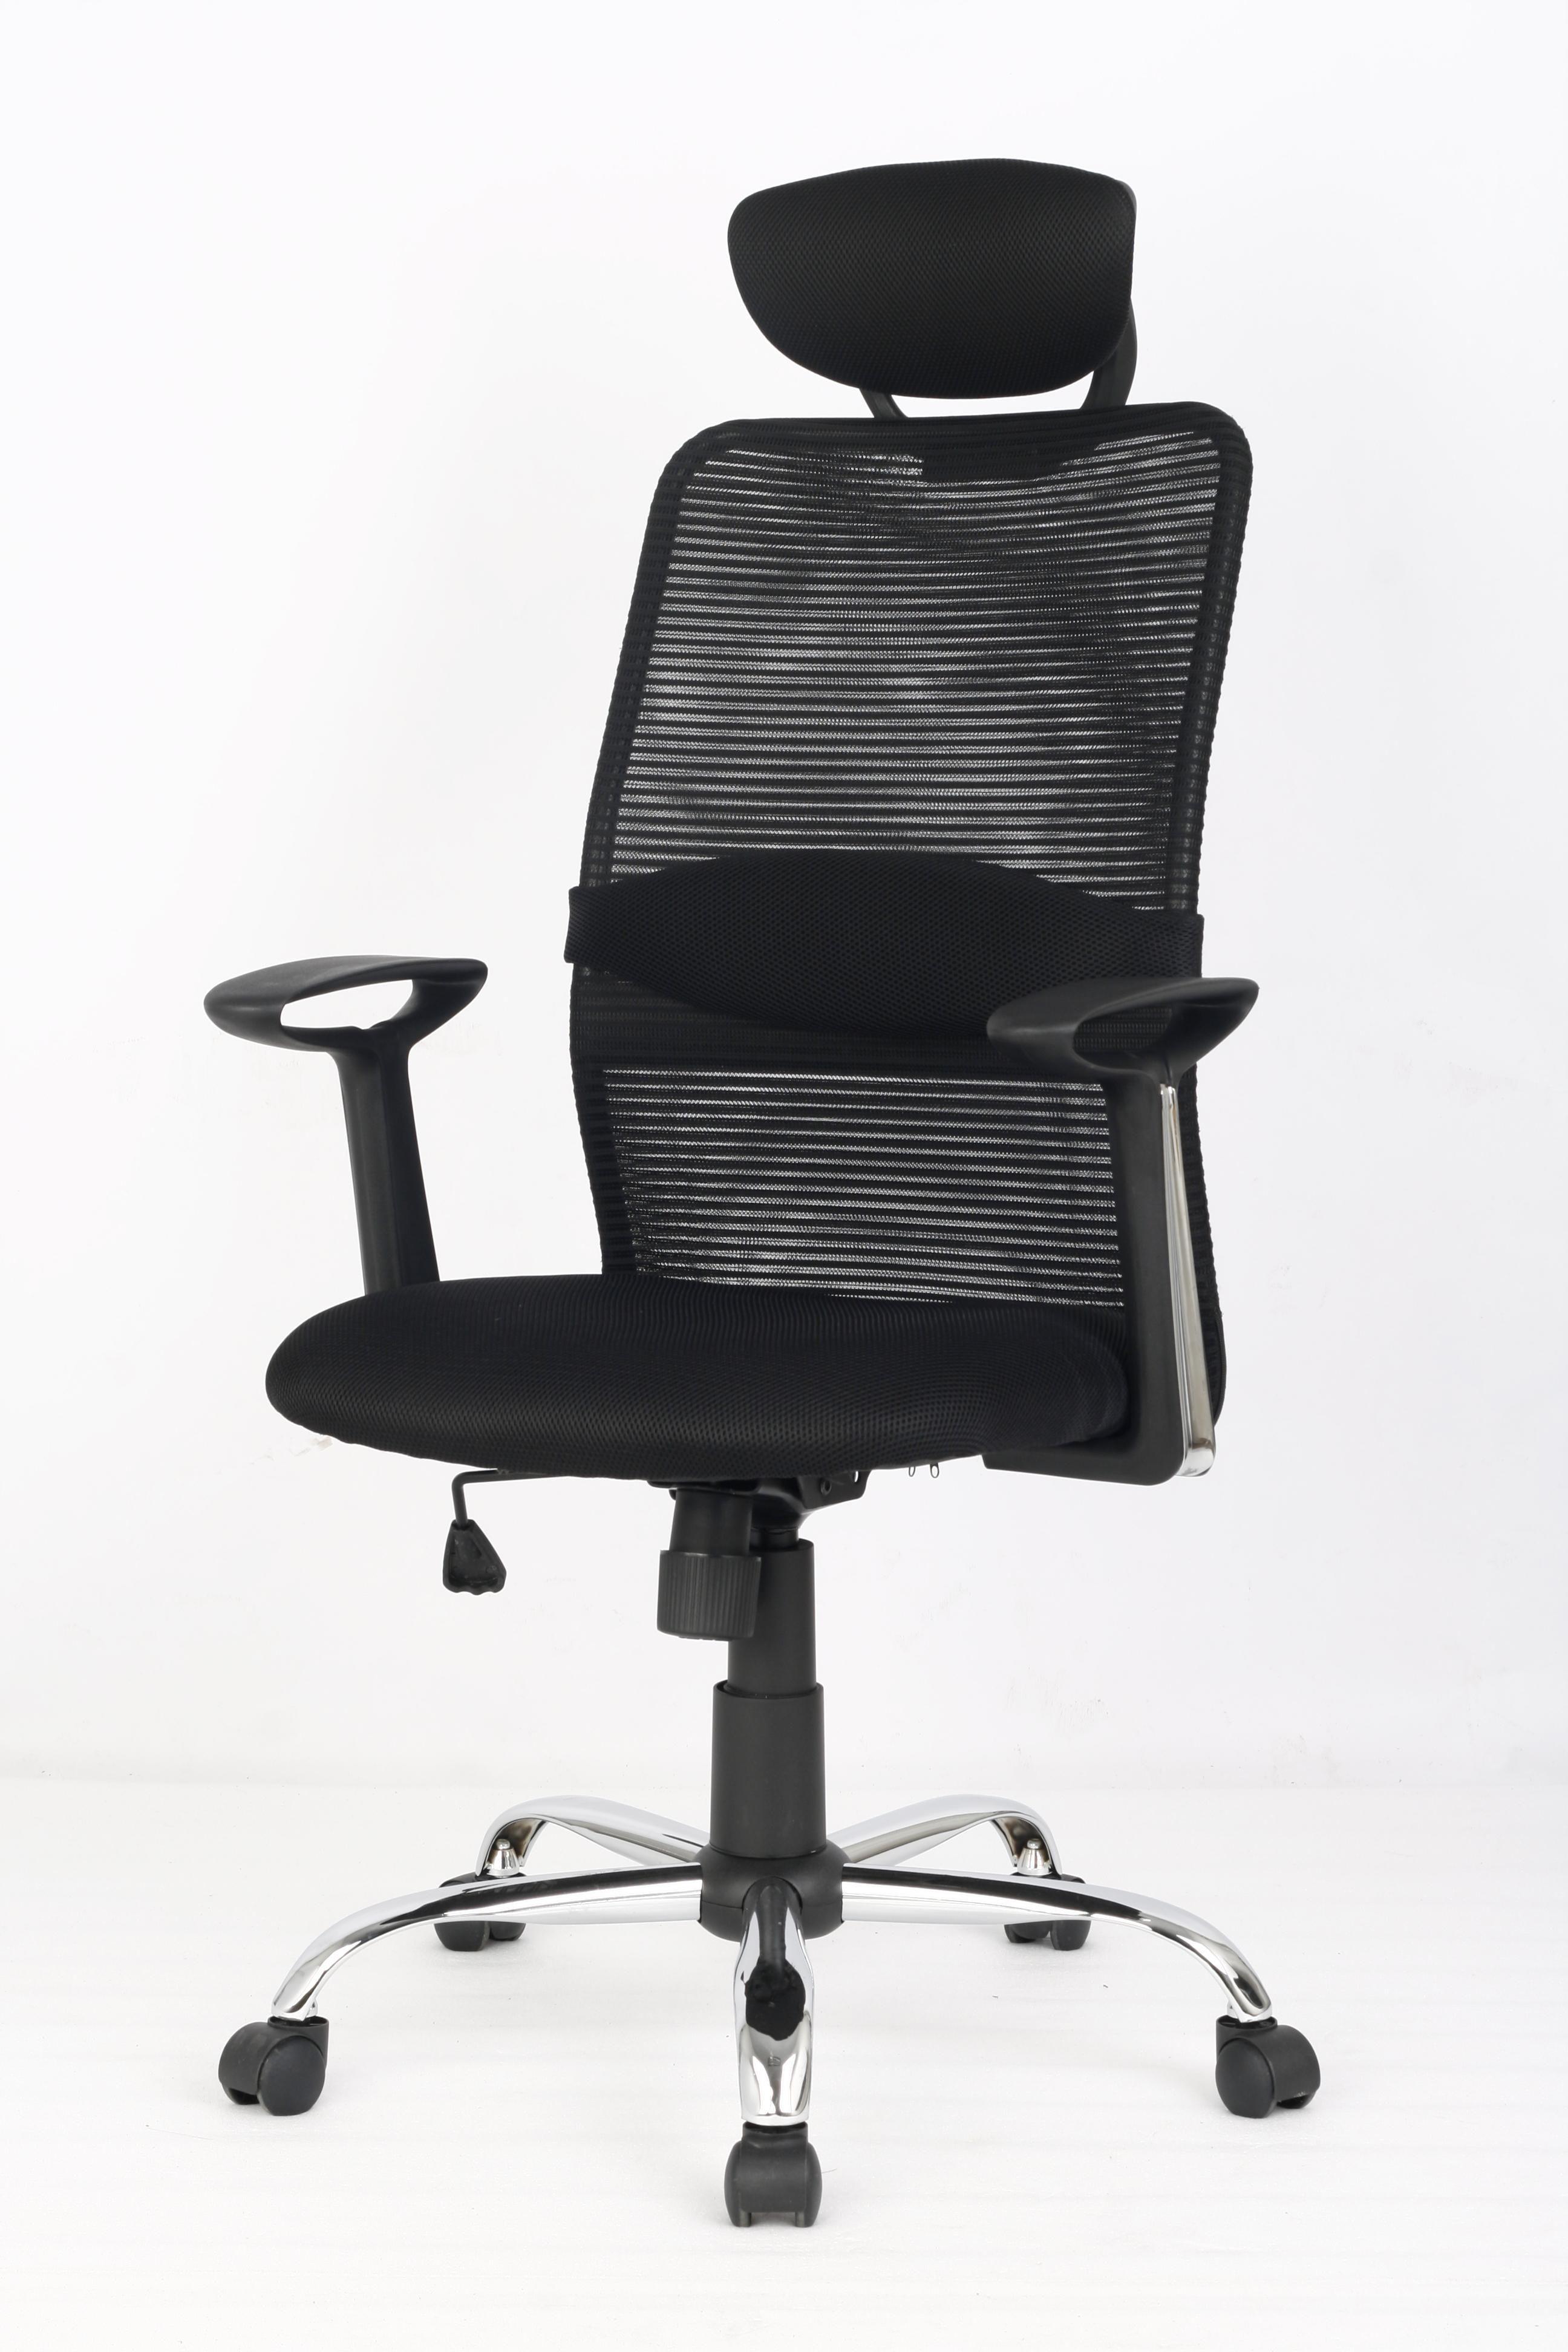 Una silla #ergonomica para oficina, el modelo Oxford. | Online Store ...